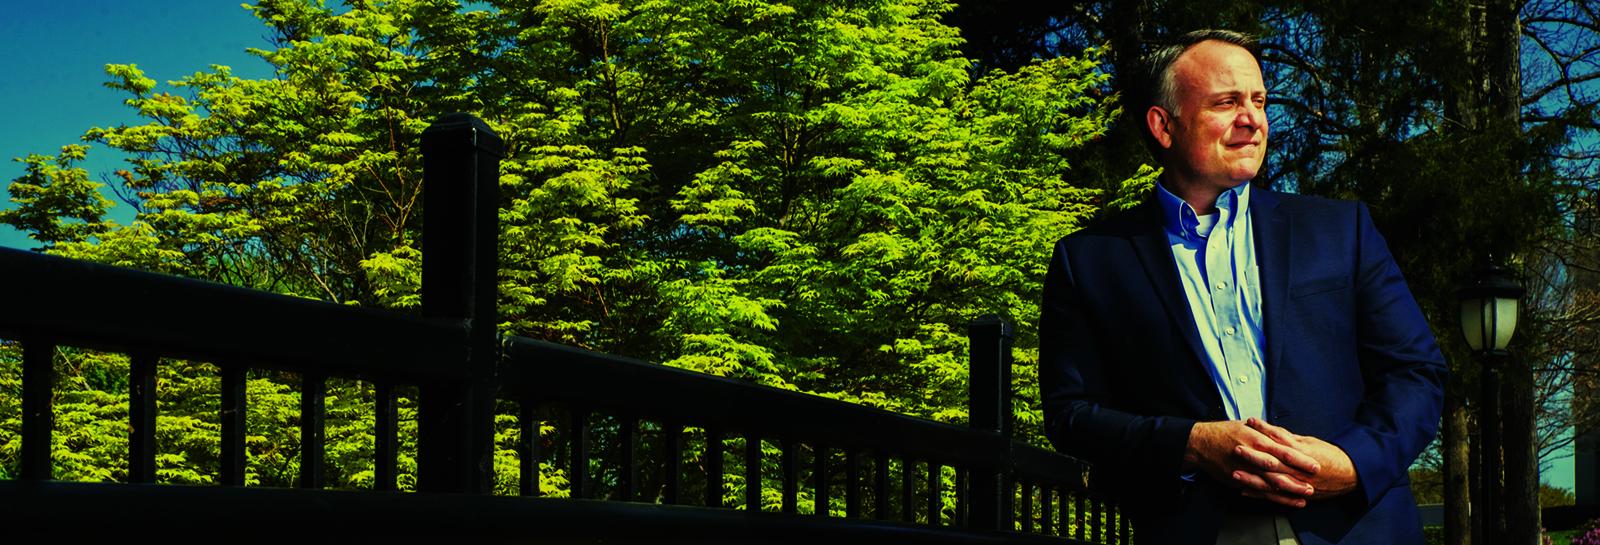 a man leaning on a railing of a bridge